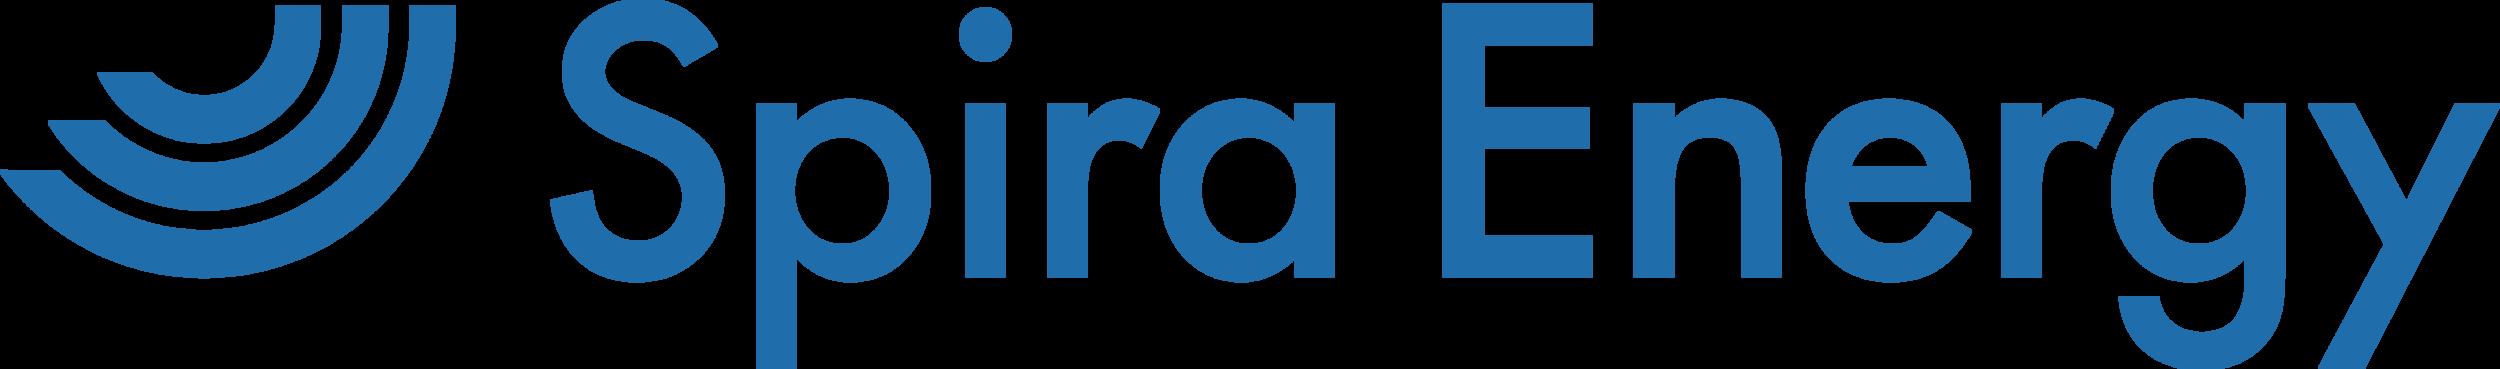 Spira_logo_blue_50px.png